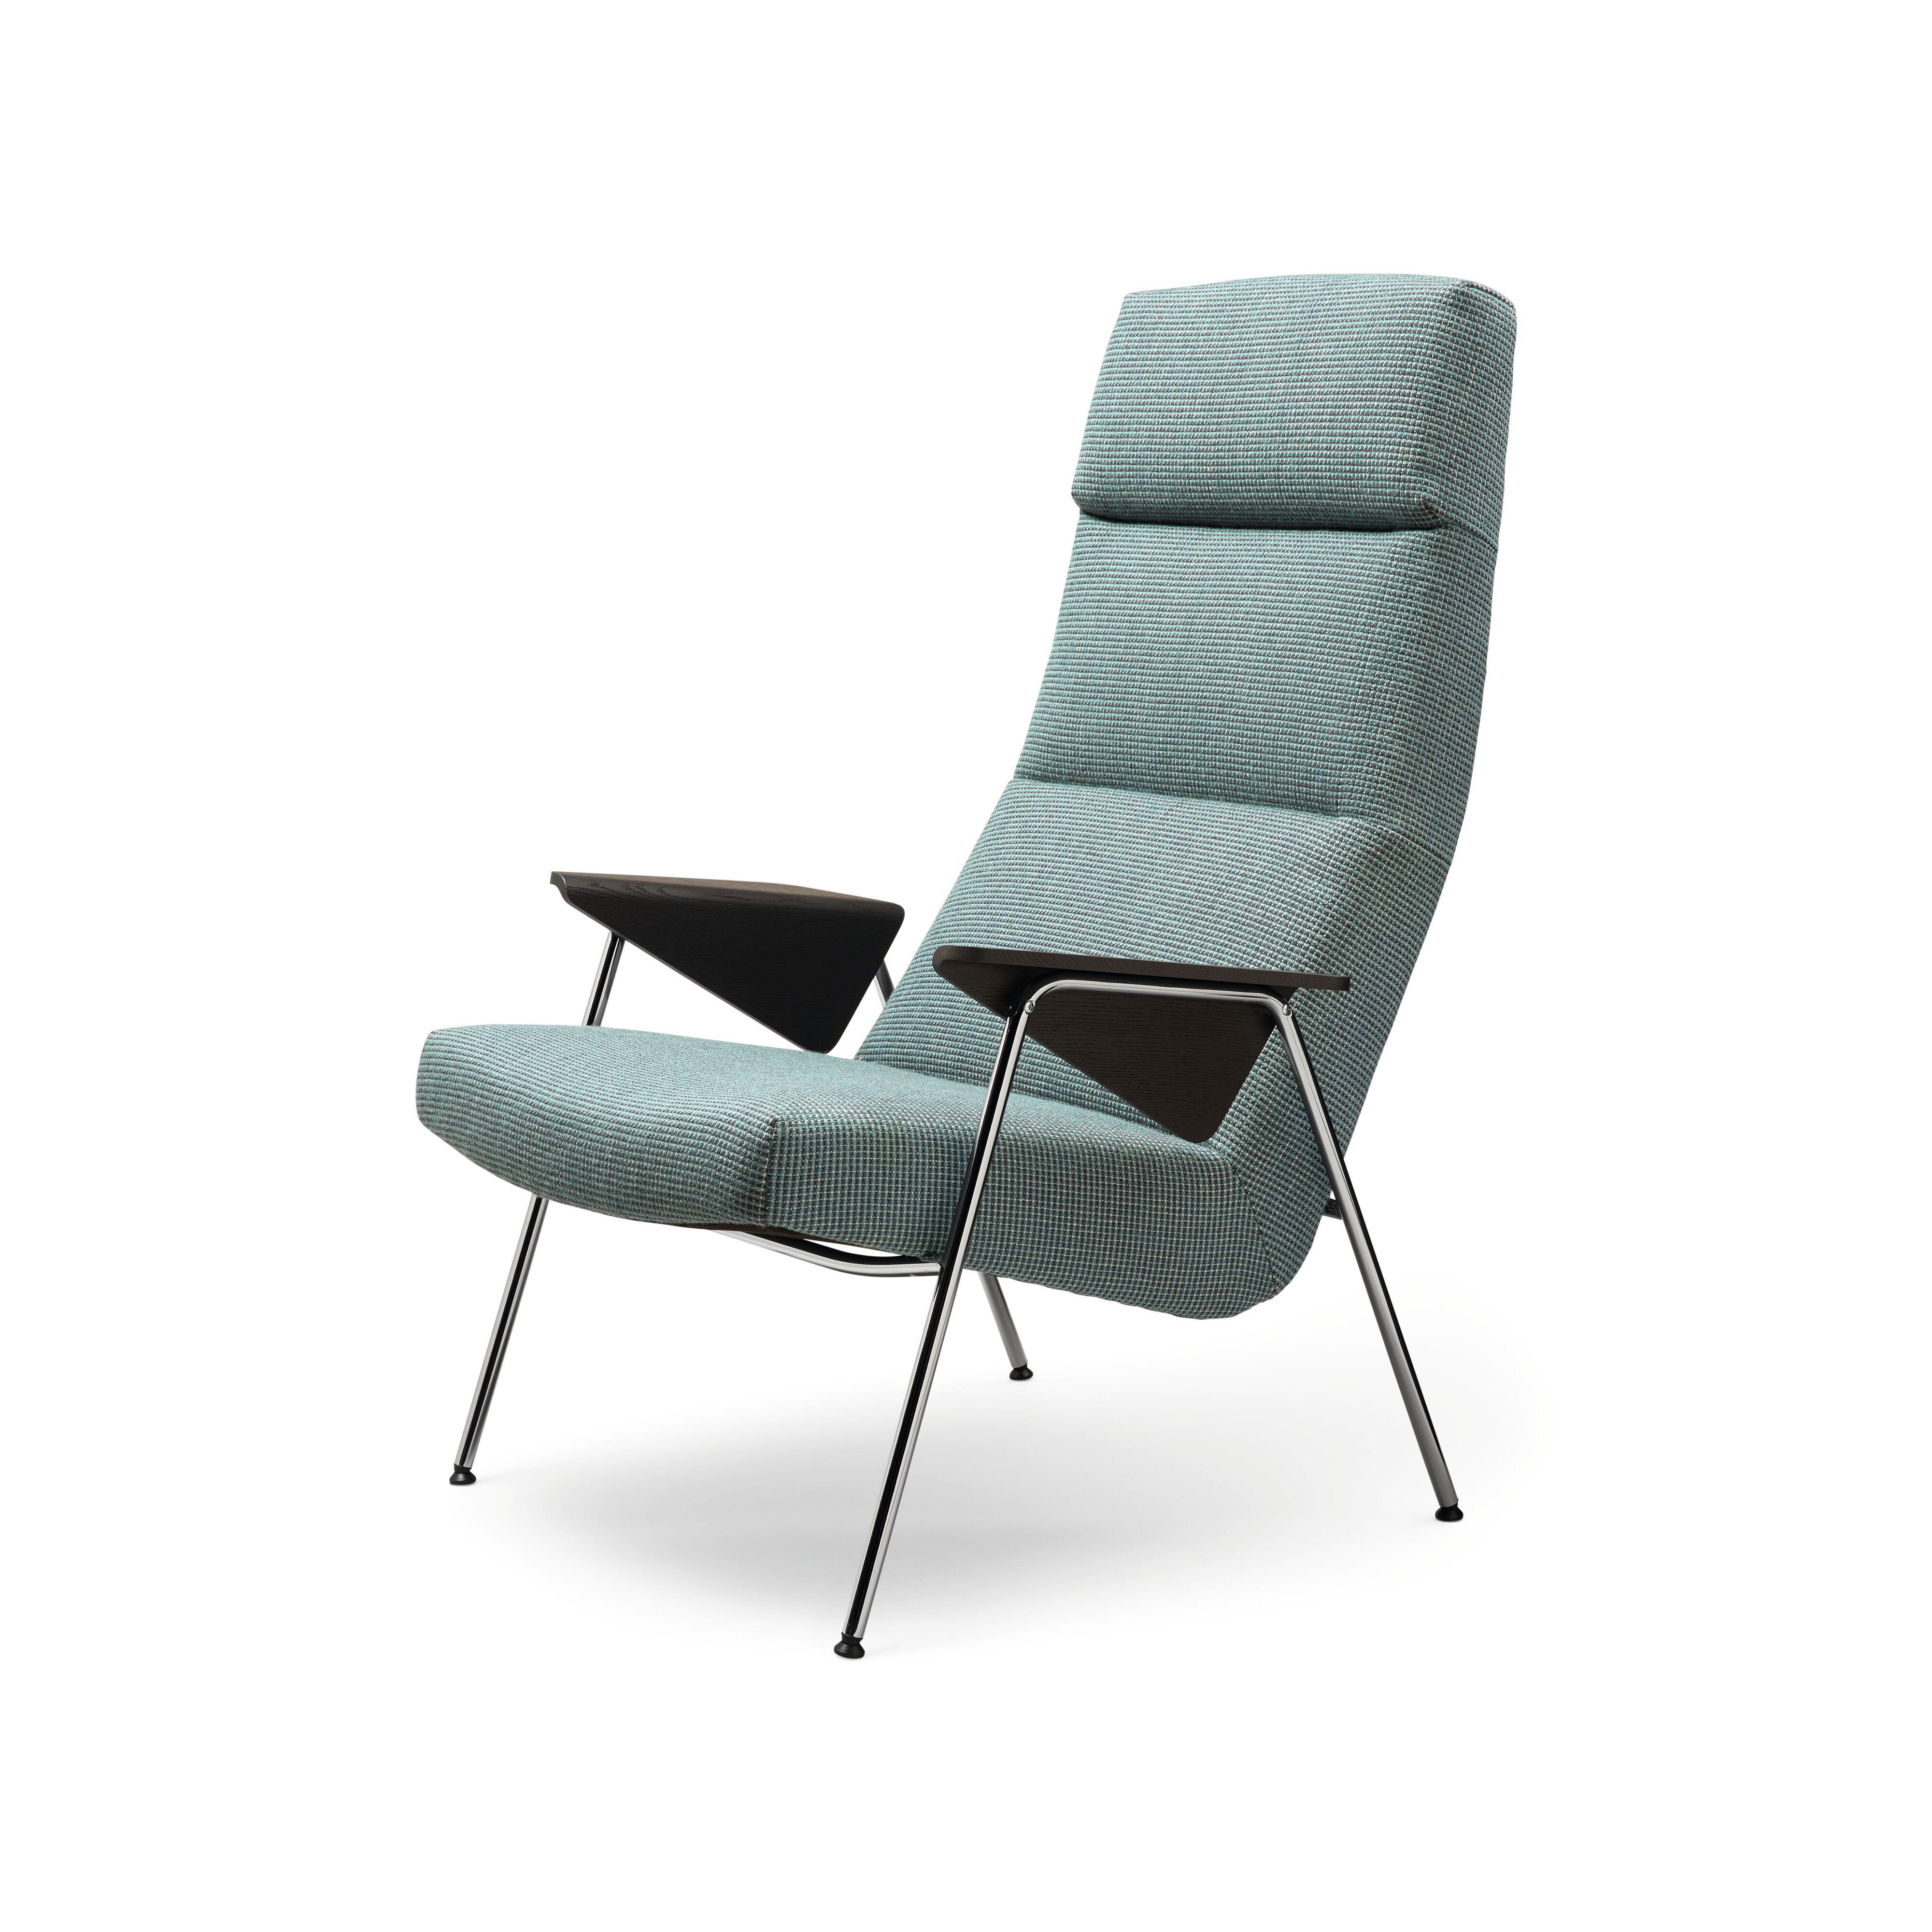 01-WK-Classic_Edition-Votteler_Chair-0014-H.tif